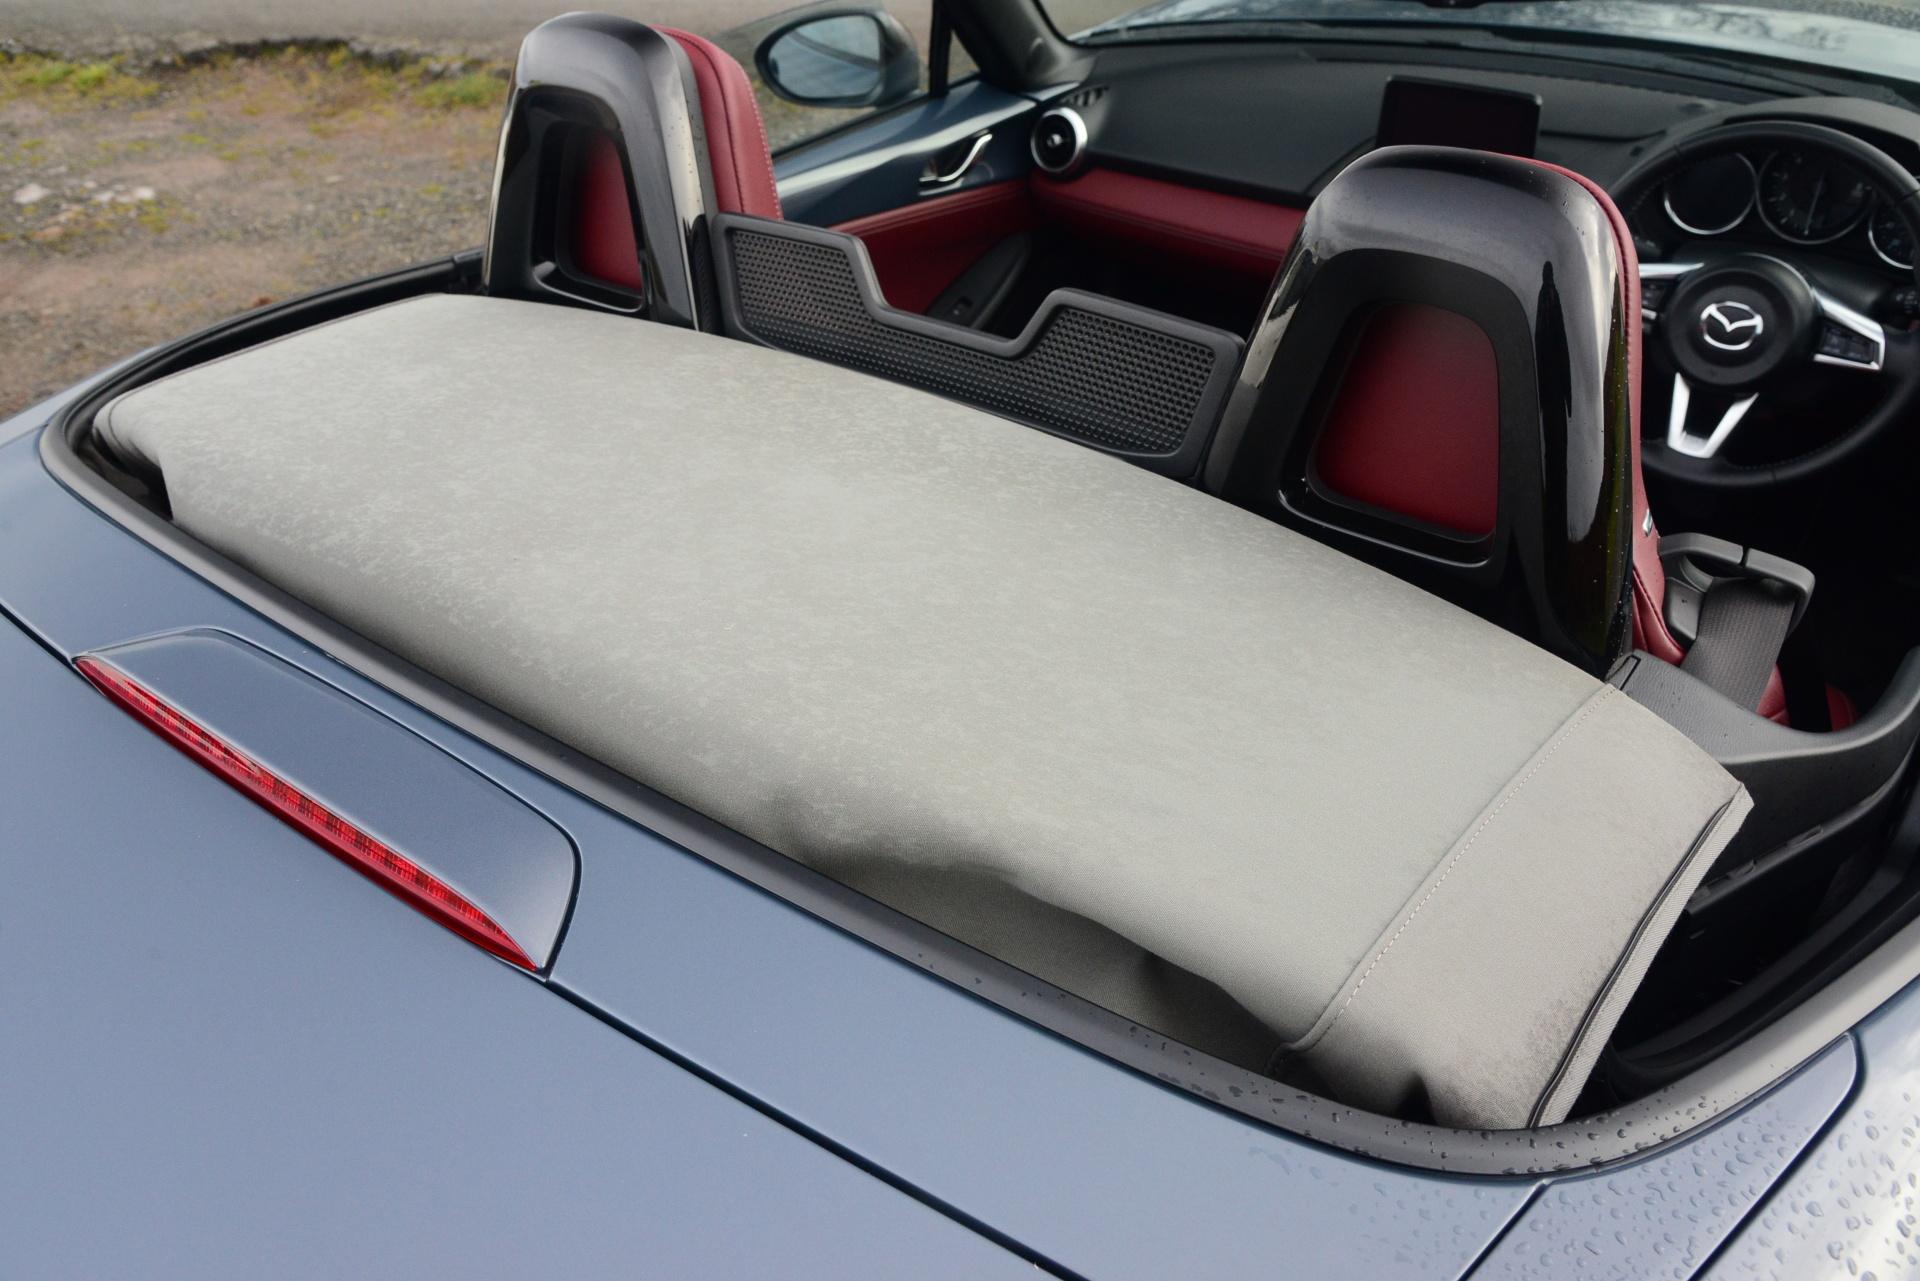 Mazda MX-5 R-Sport rear cover decklid detail